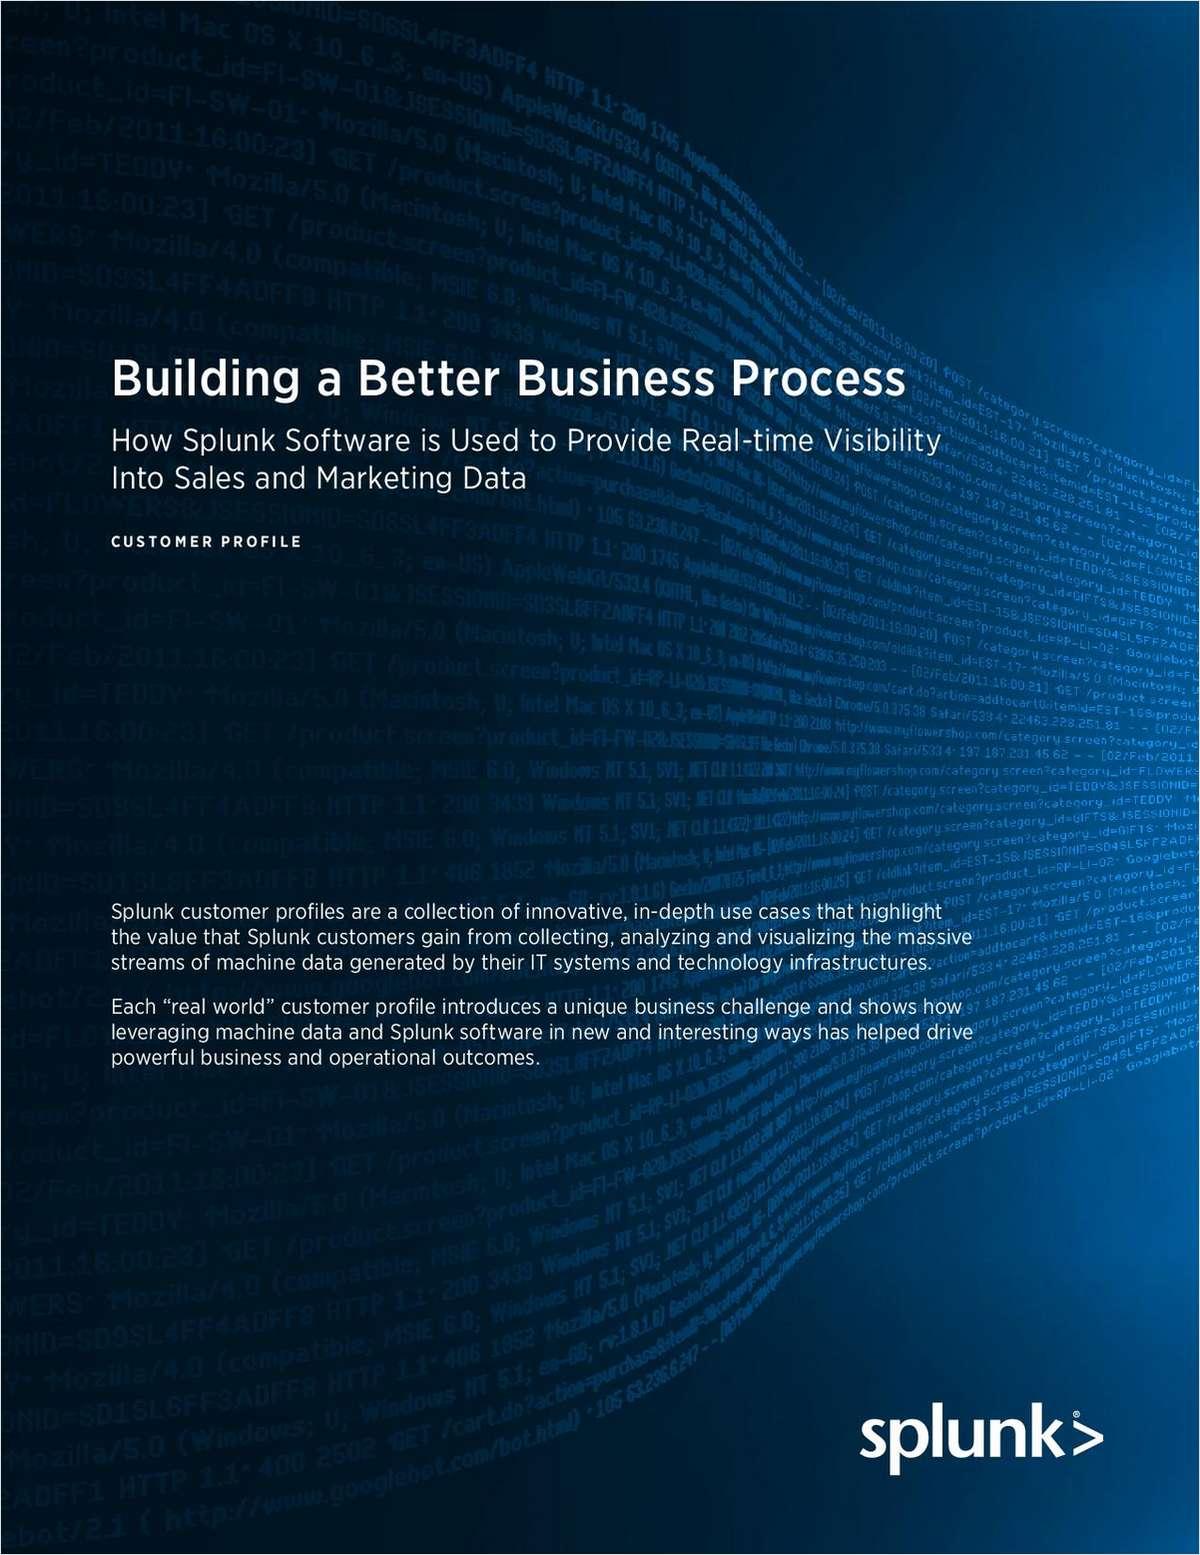 Building a Better Business Process